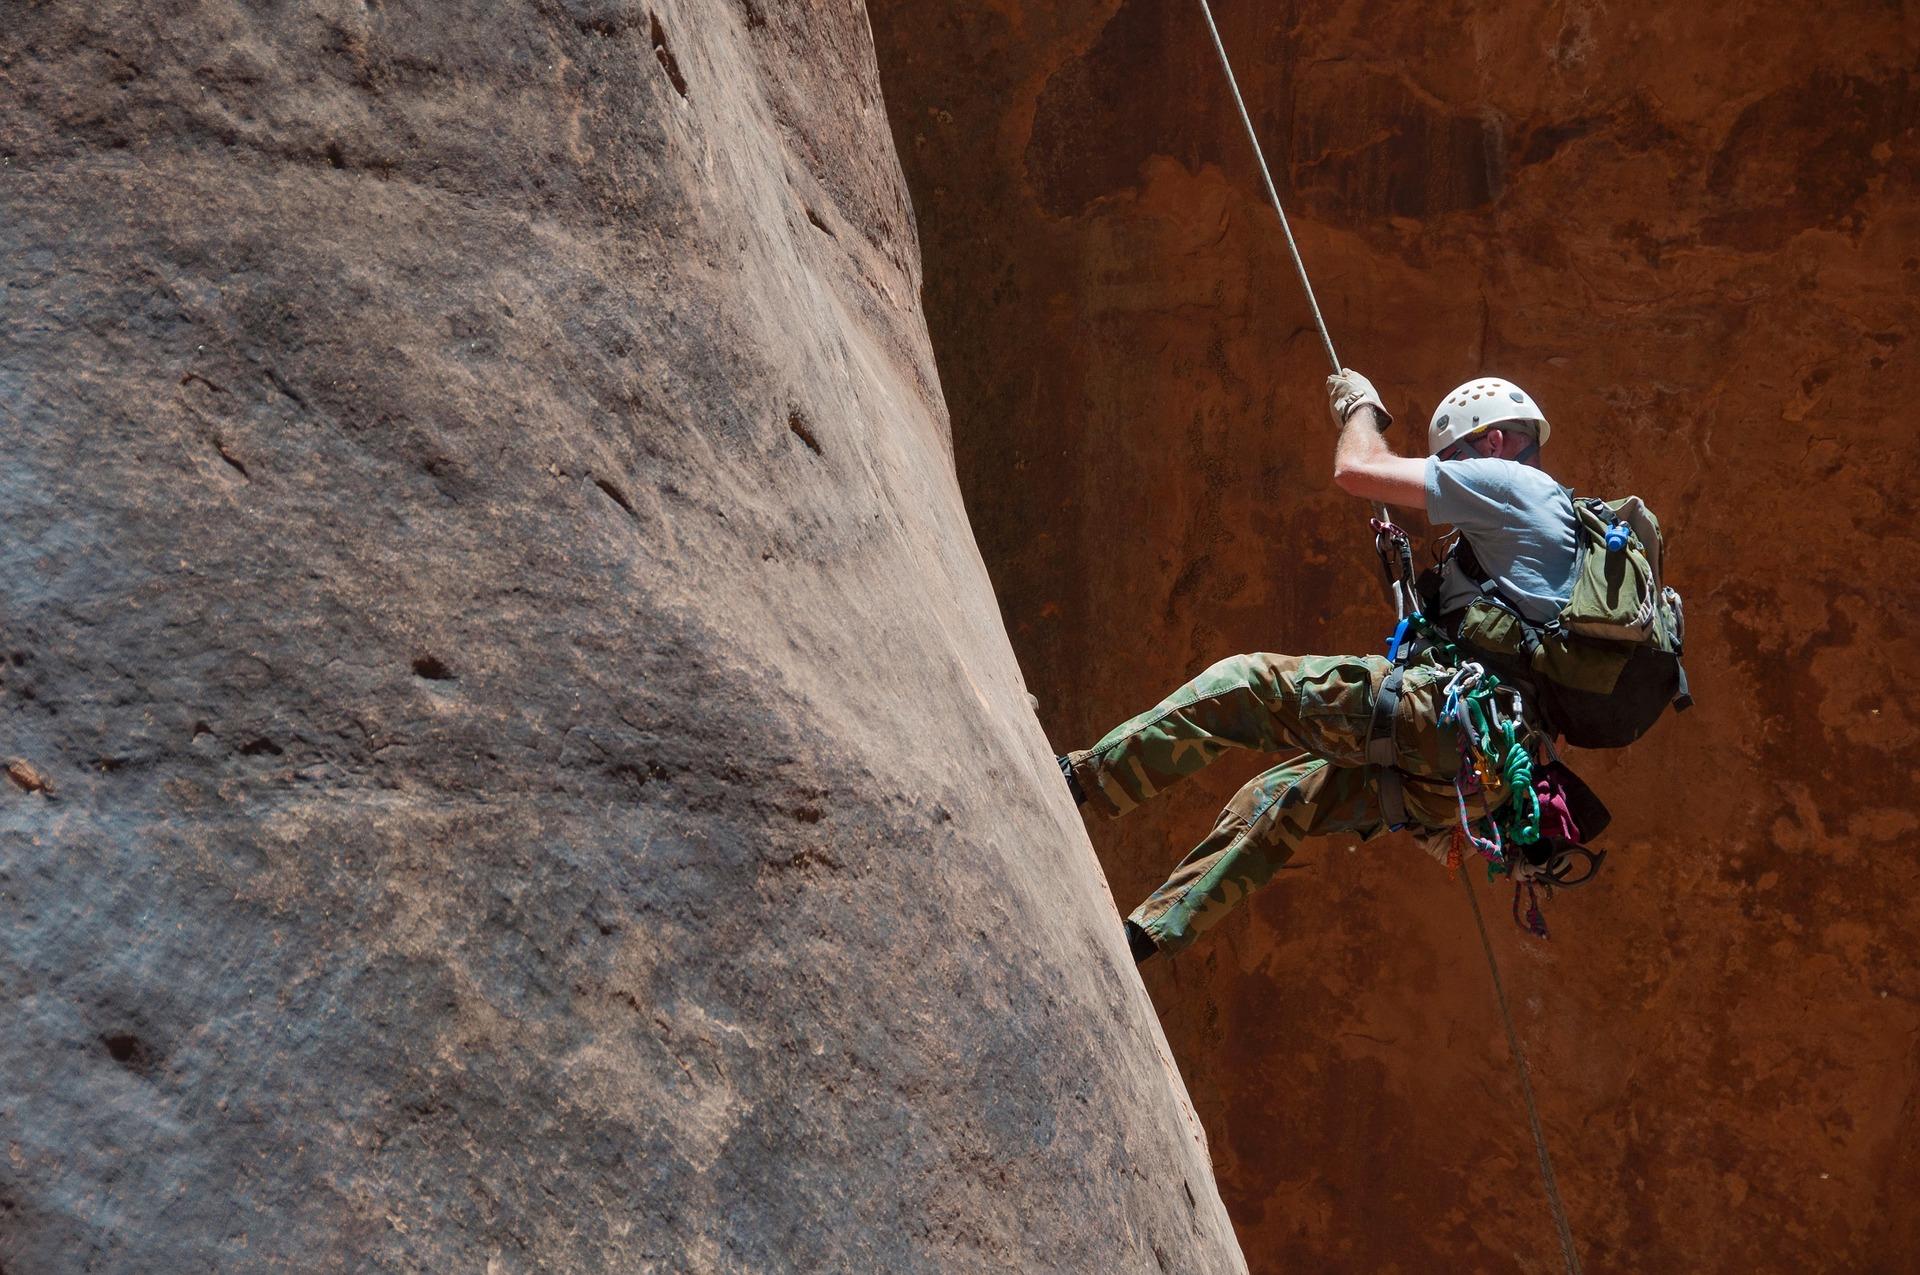 climbing-1761387_1920.jpg